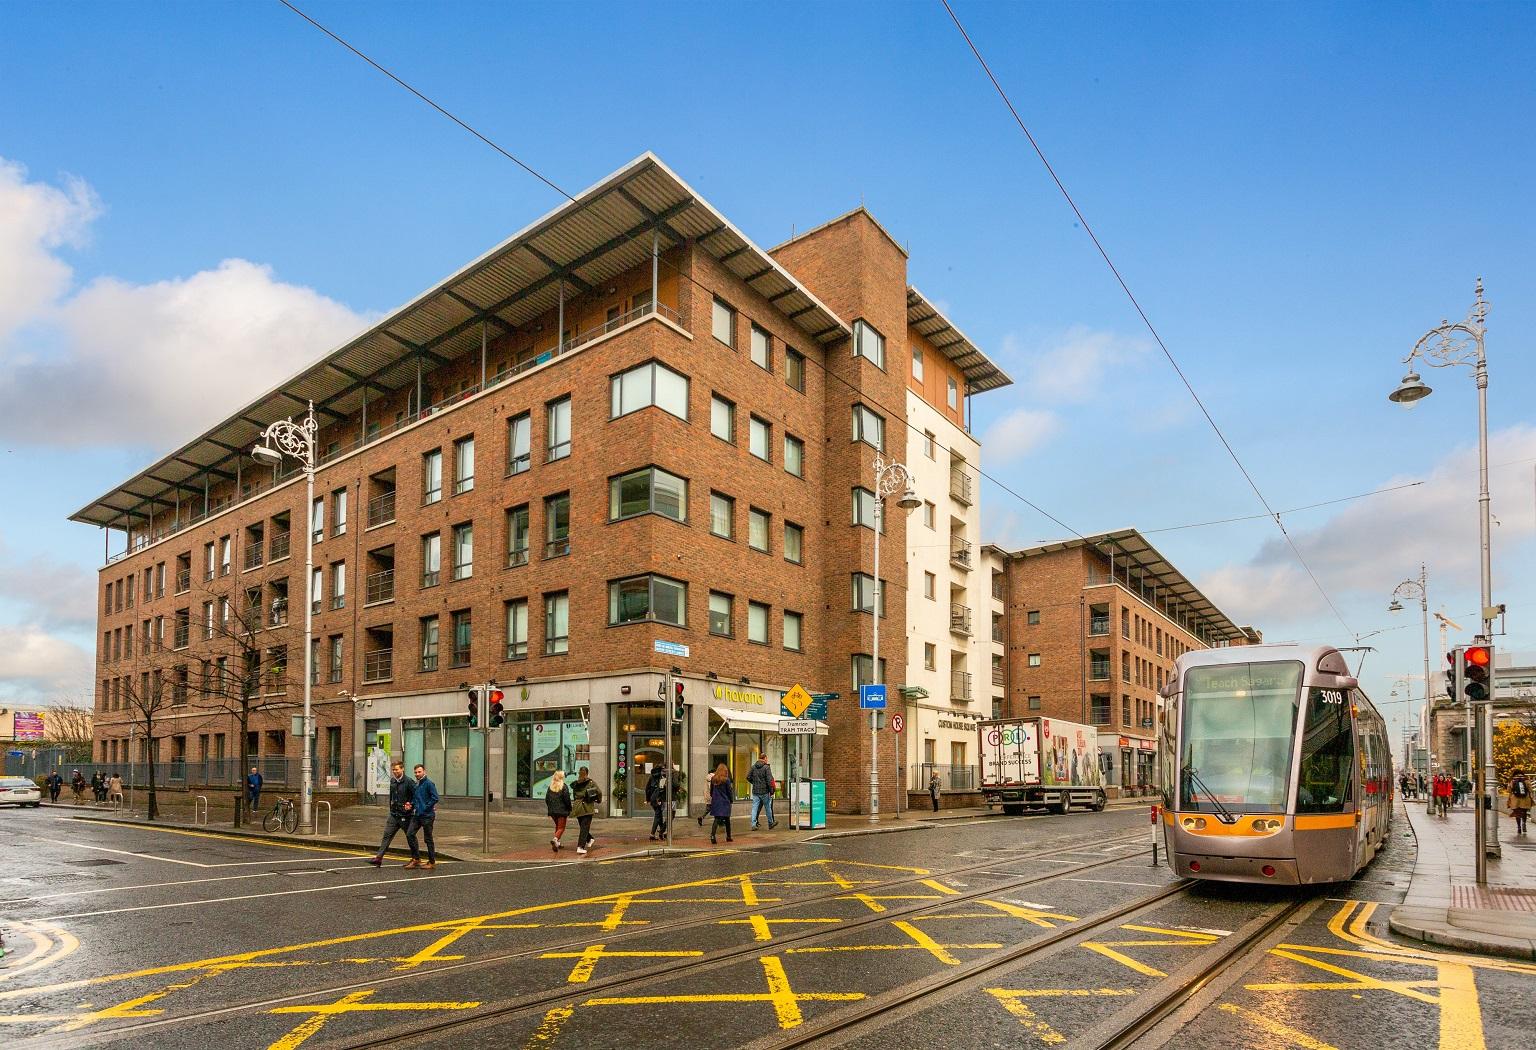 147 Shannon House, Custom House Square, IFSC, Dublin 1.